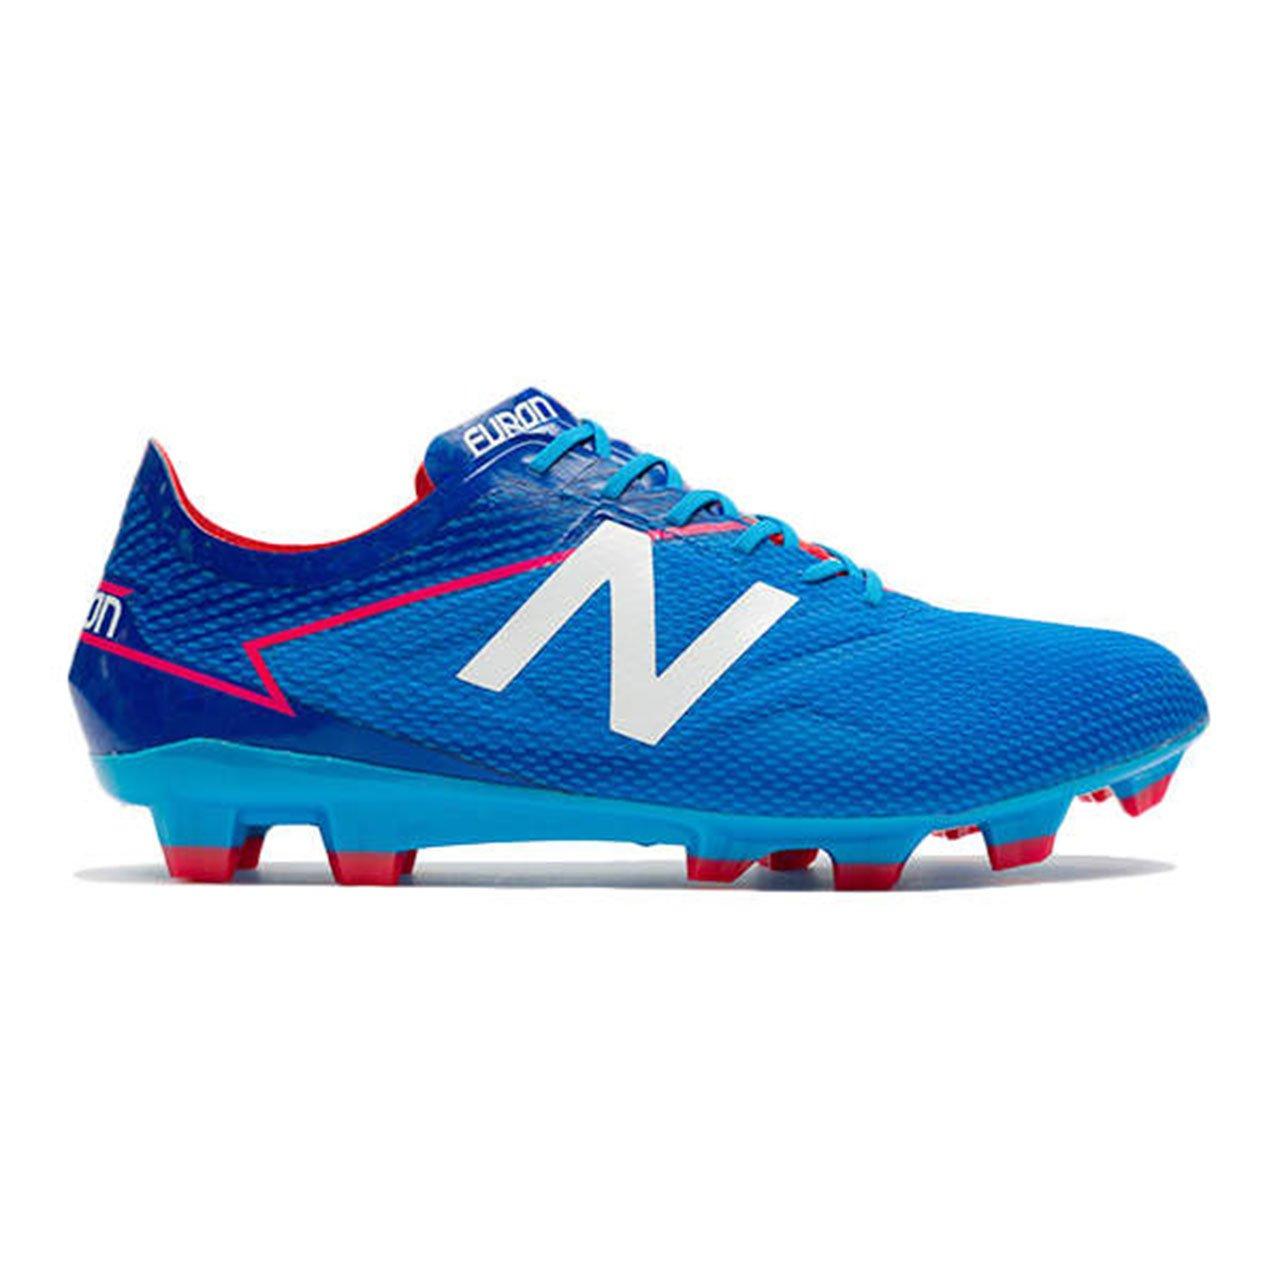 17FW NewBalance ニューバランスシューズ サッカー FURON PRO HG (メンズ/ユニセックス) MSFPHLT32E B074DCQBBZ 26.5|LT3:BLUE/PINK LT3:BLUE/PINK 26.5